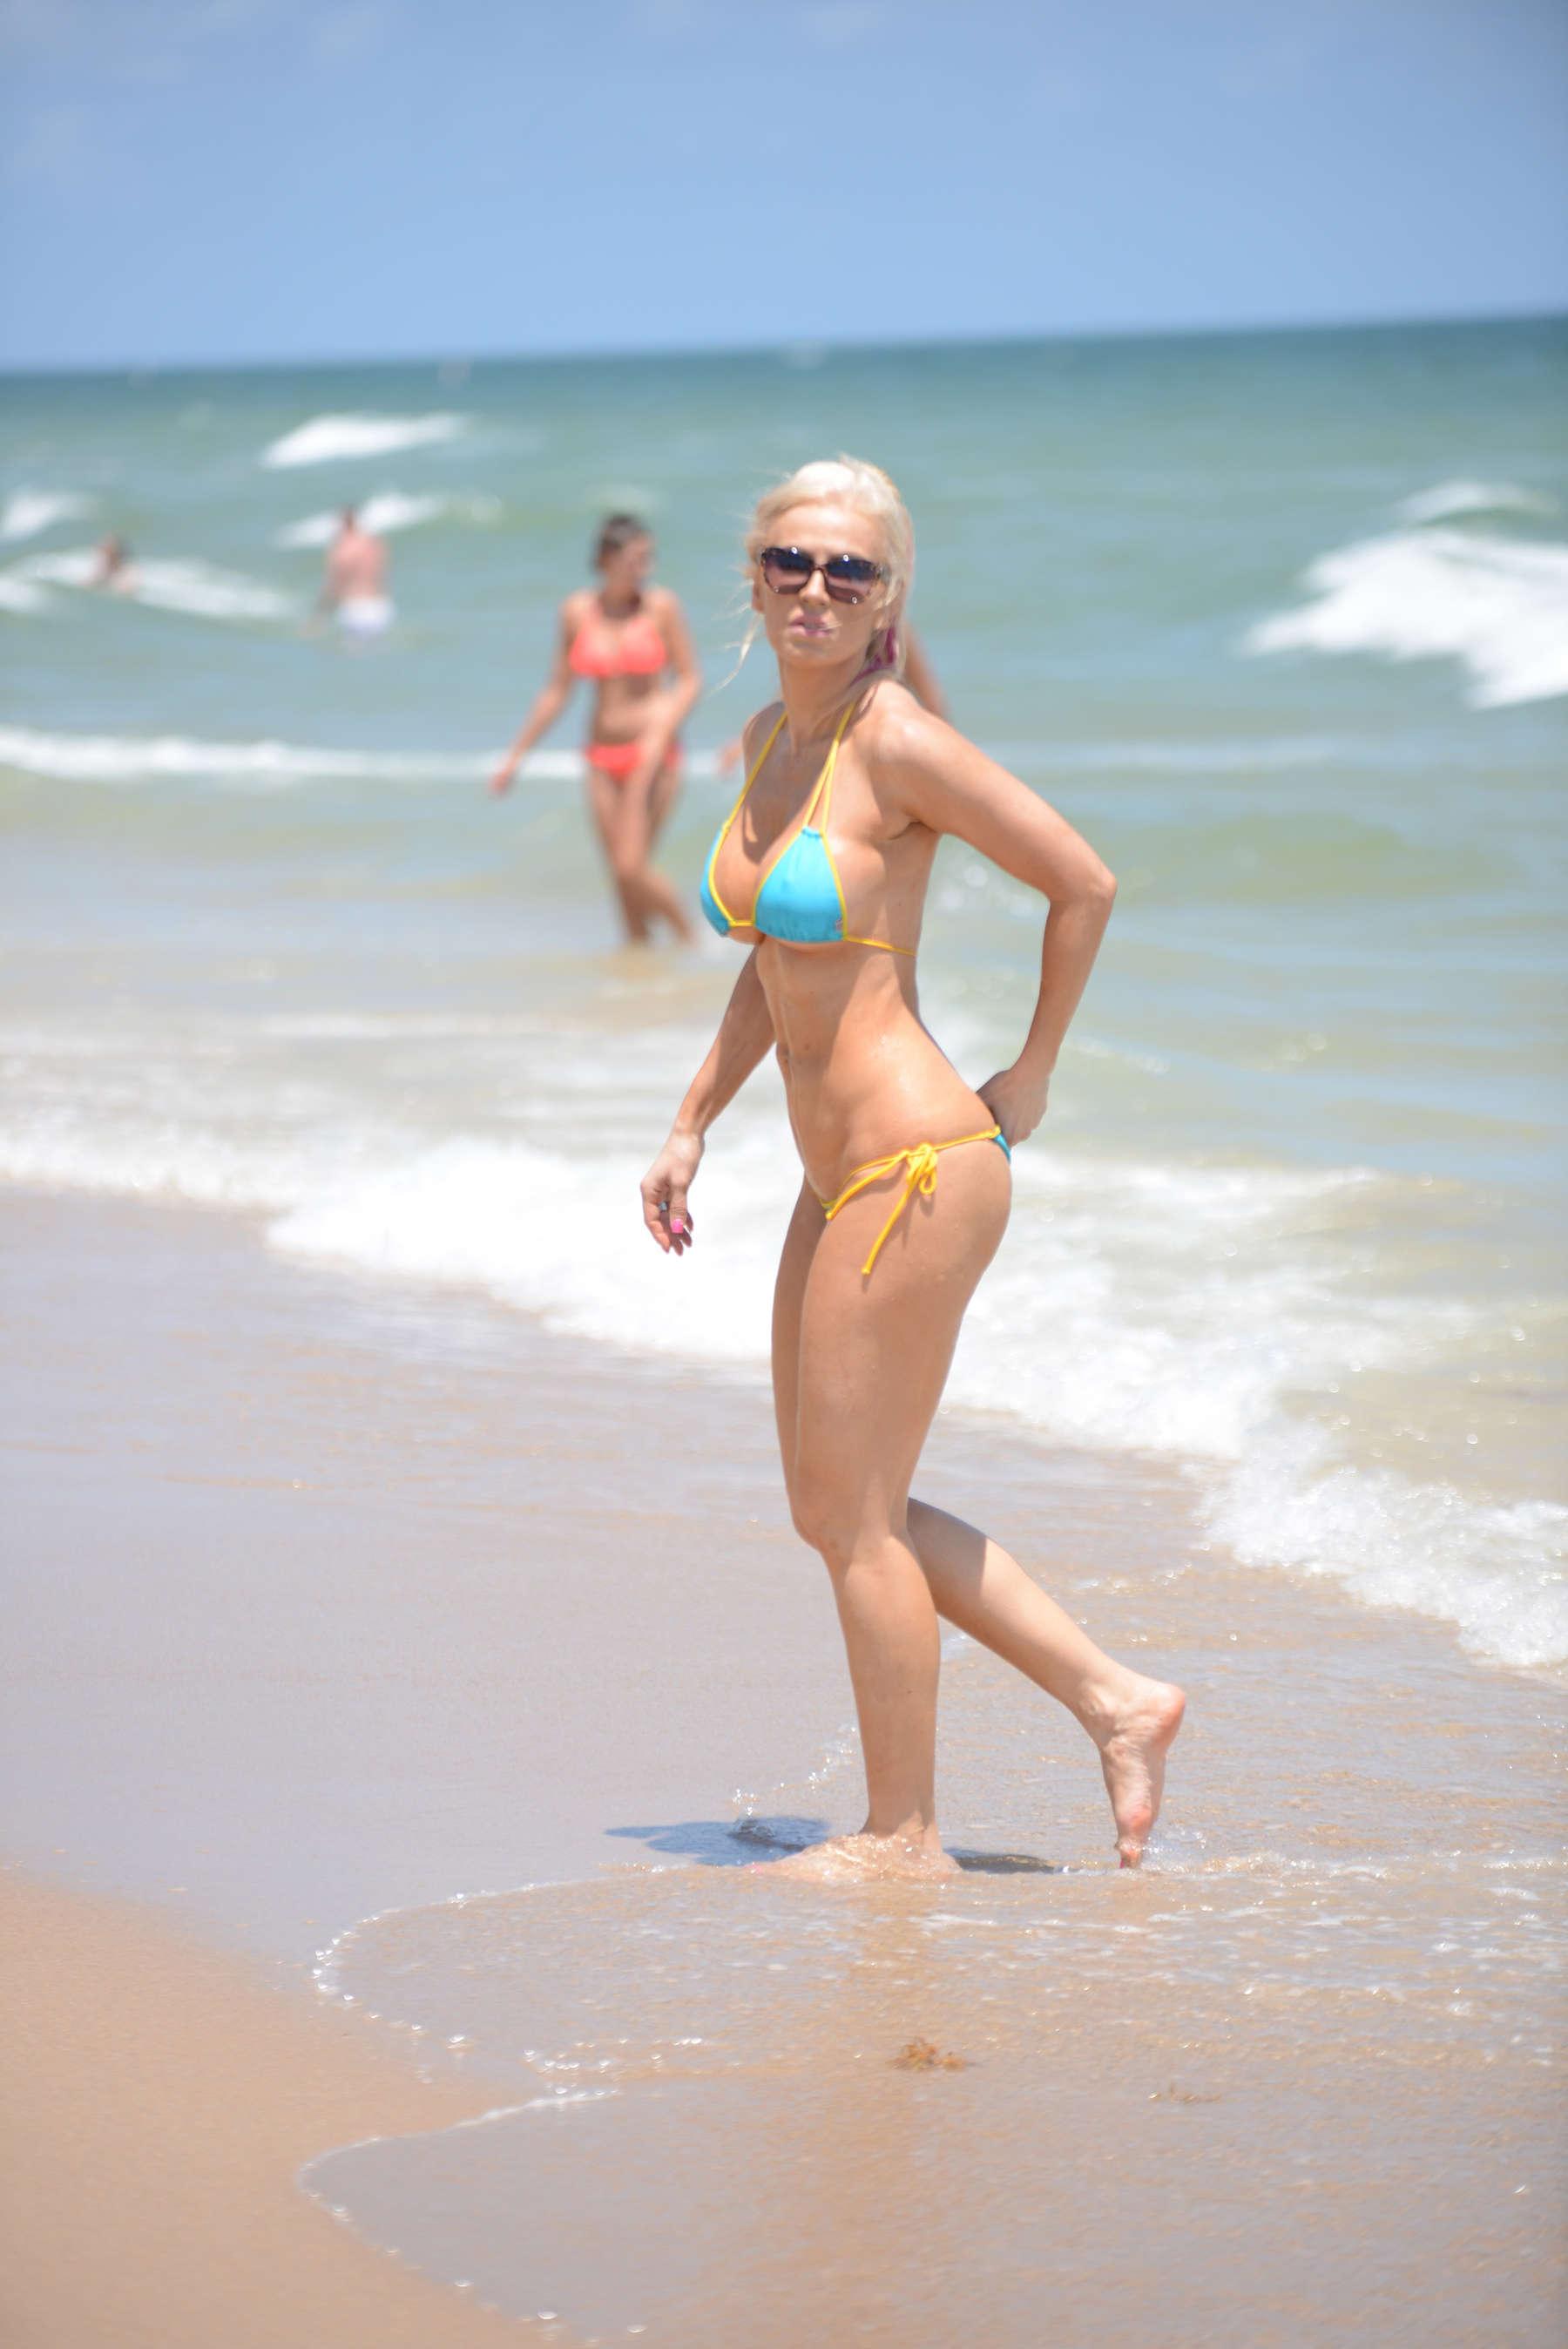 Ana Braga 2016 : Ana Braga in Tiny Blue Bikini -31